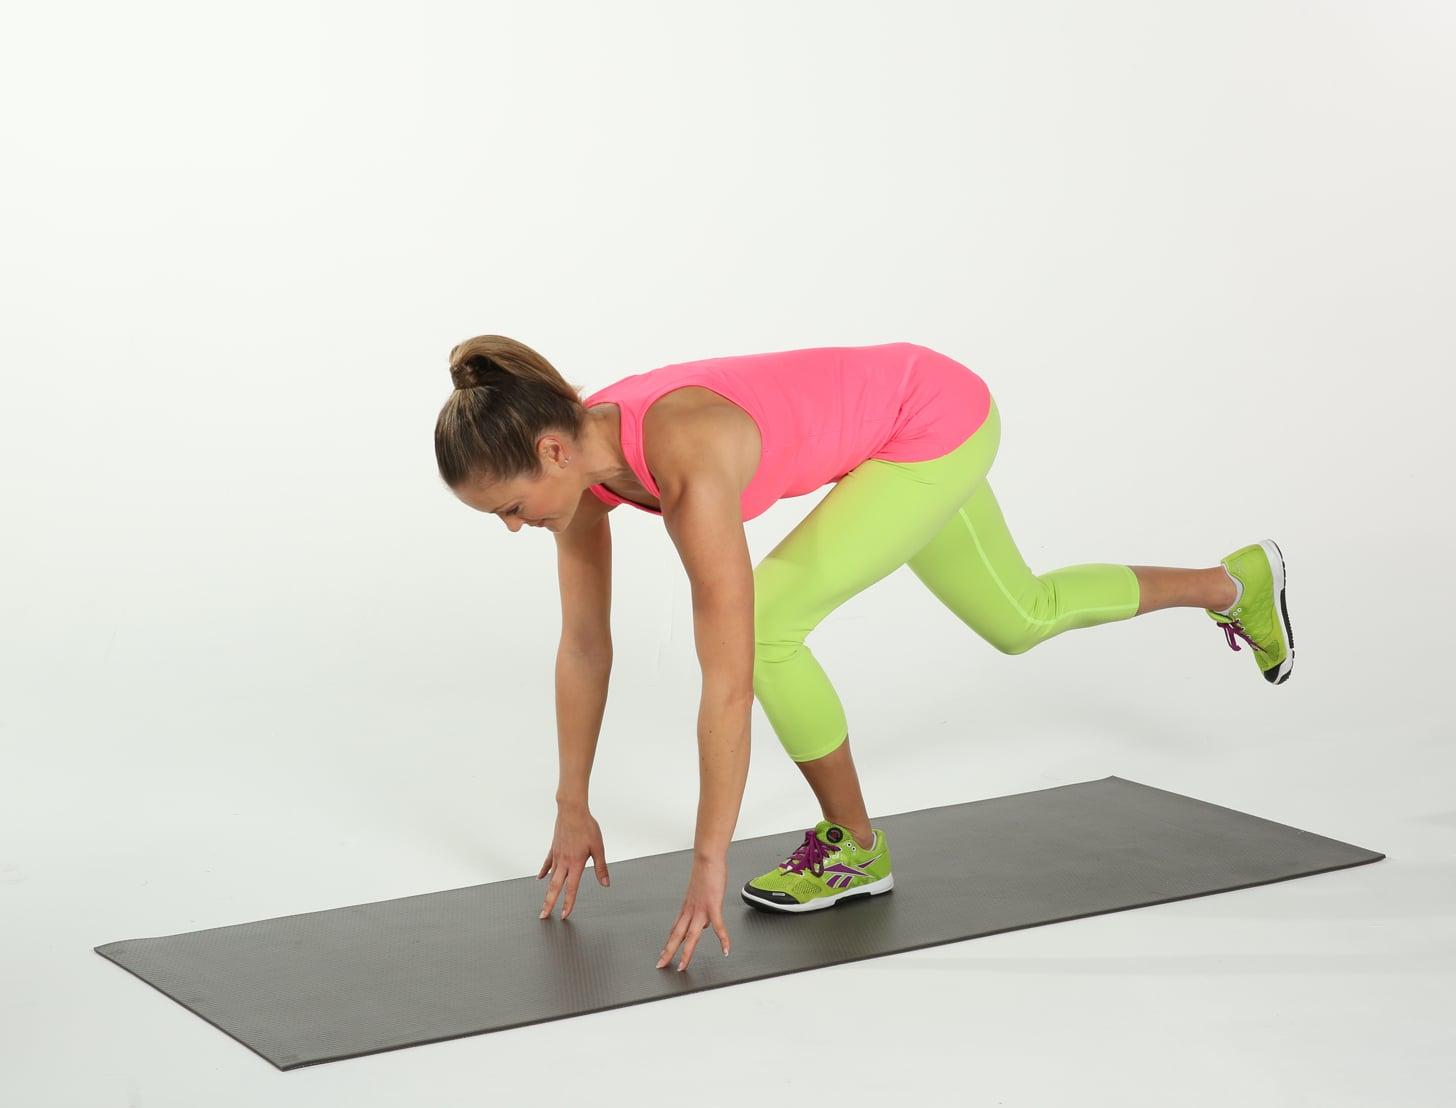 Lower Body: Single-Leg Balance Touch